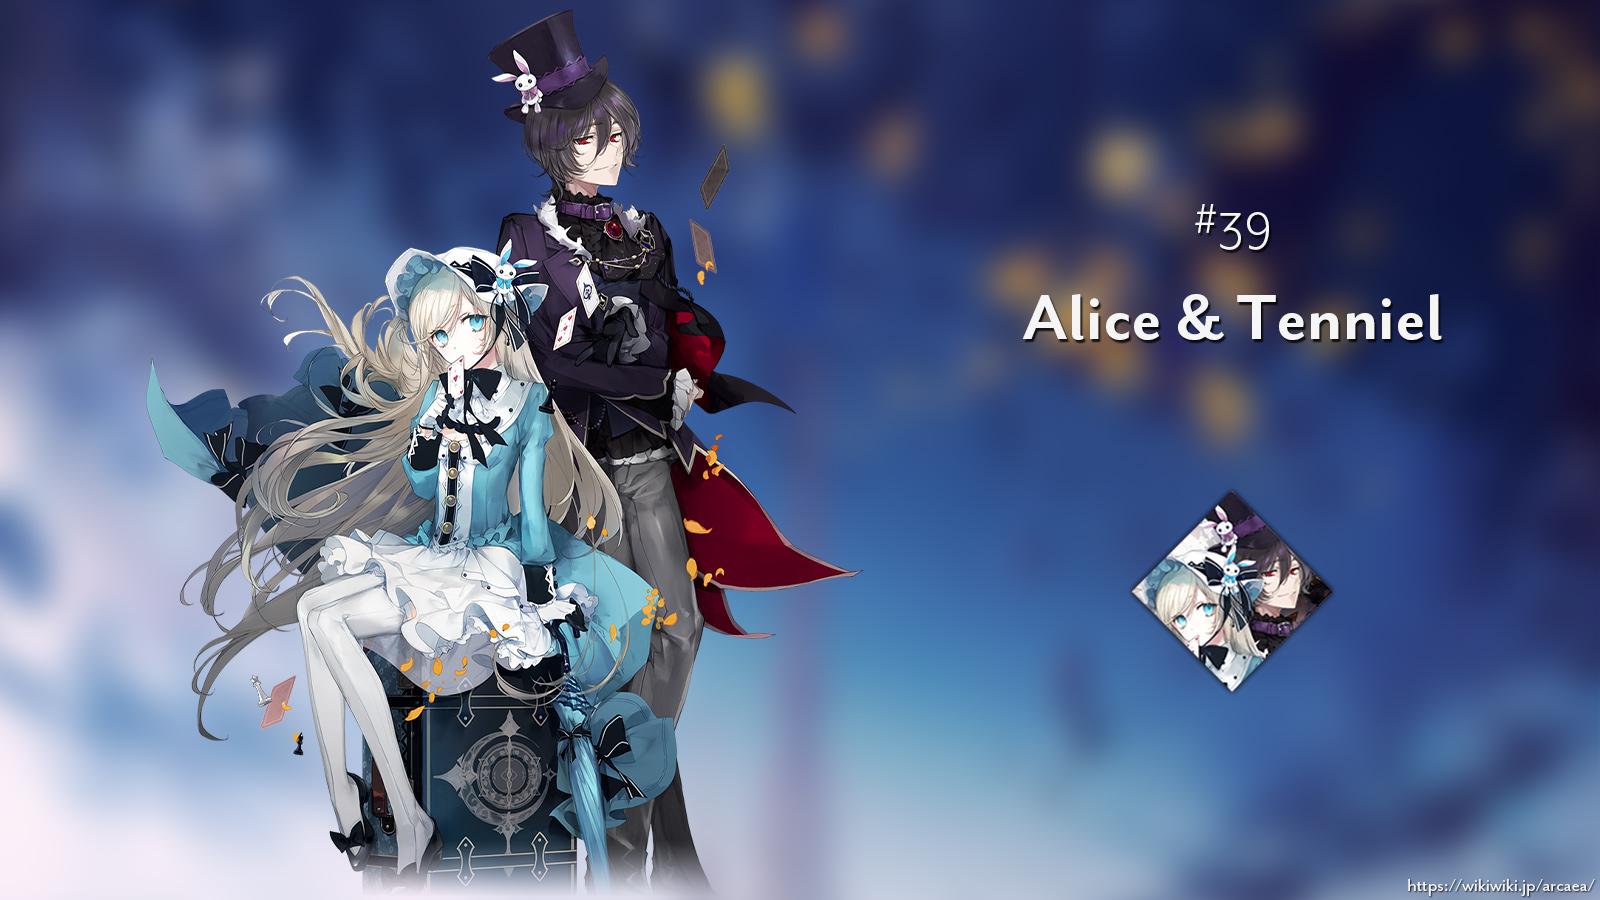 Alice & Tenniel